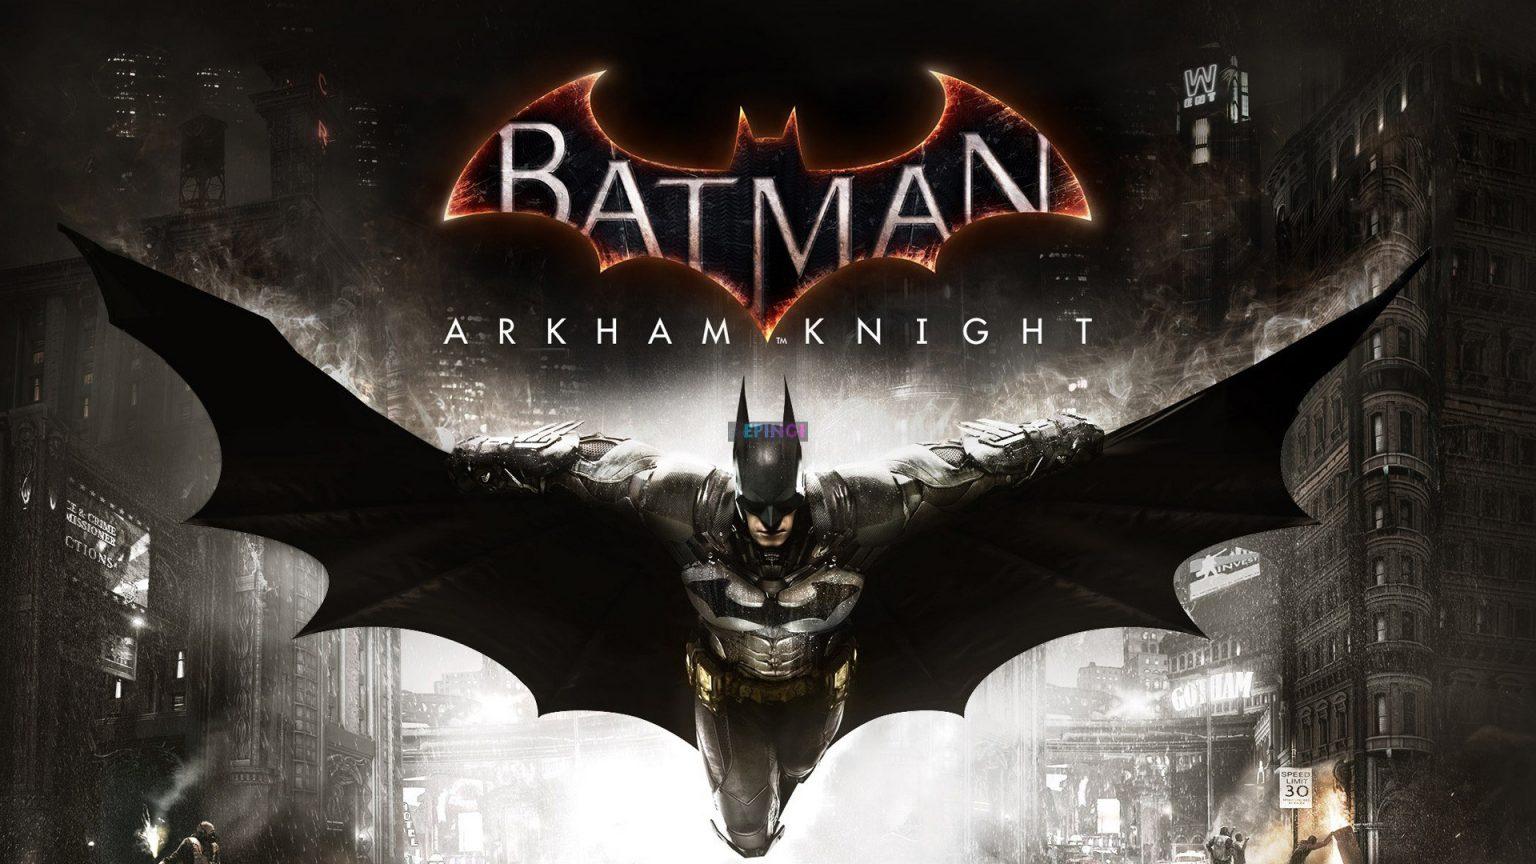 Batman Arkham Knight Nintendo Switch PC Latest Version Game Free Download